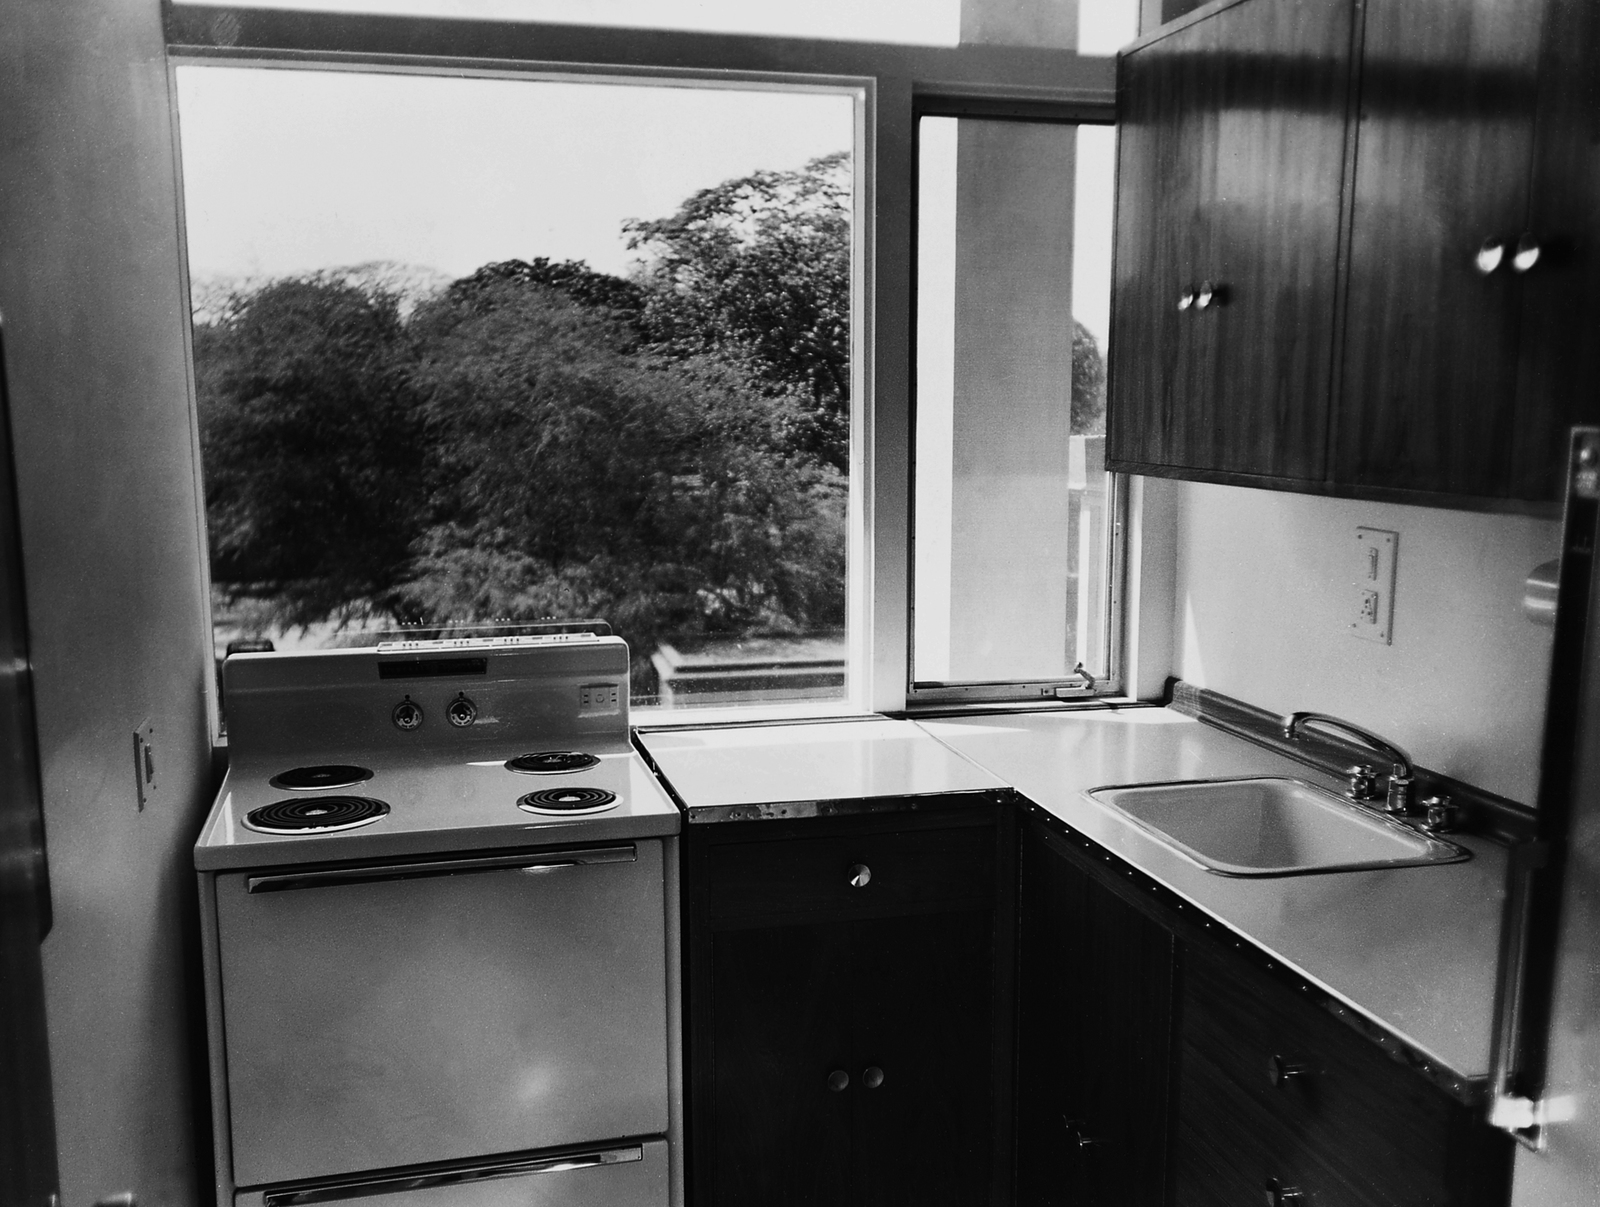 Calcutta - Multi-Unit Residential Building - 1961